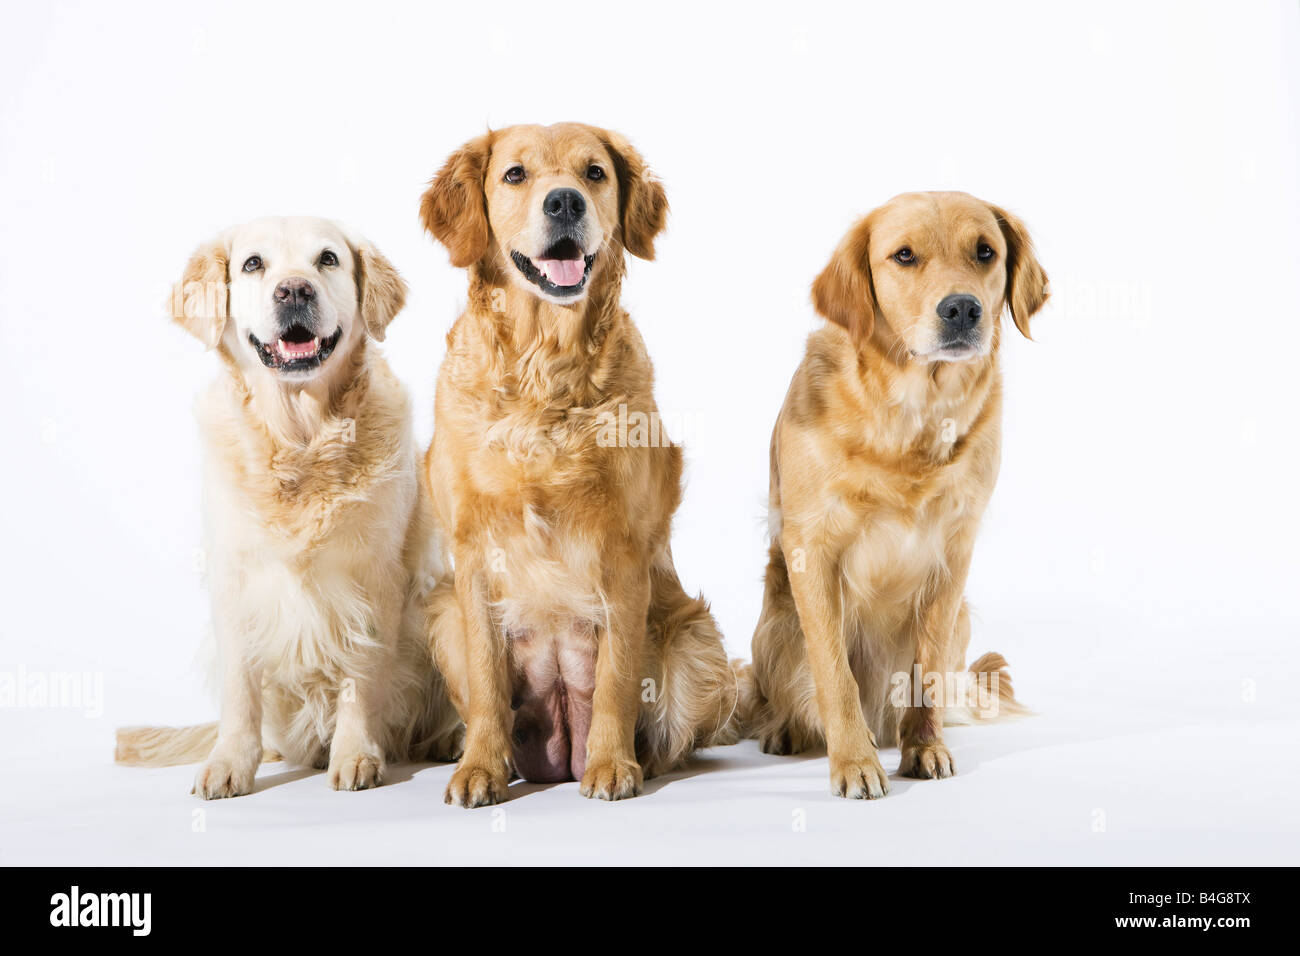 Three Golden Retrievers - Stock Image